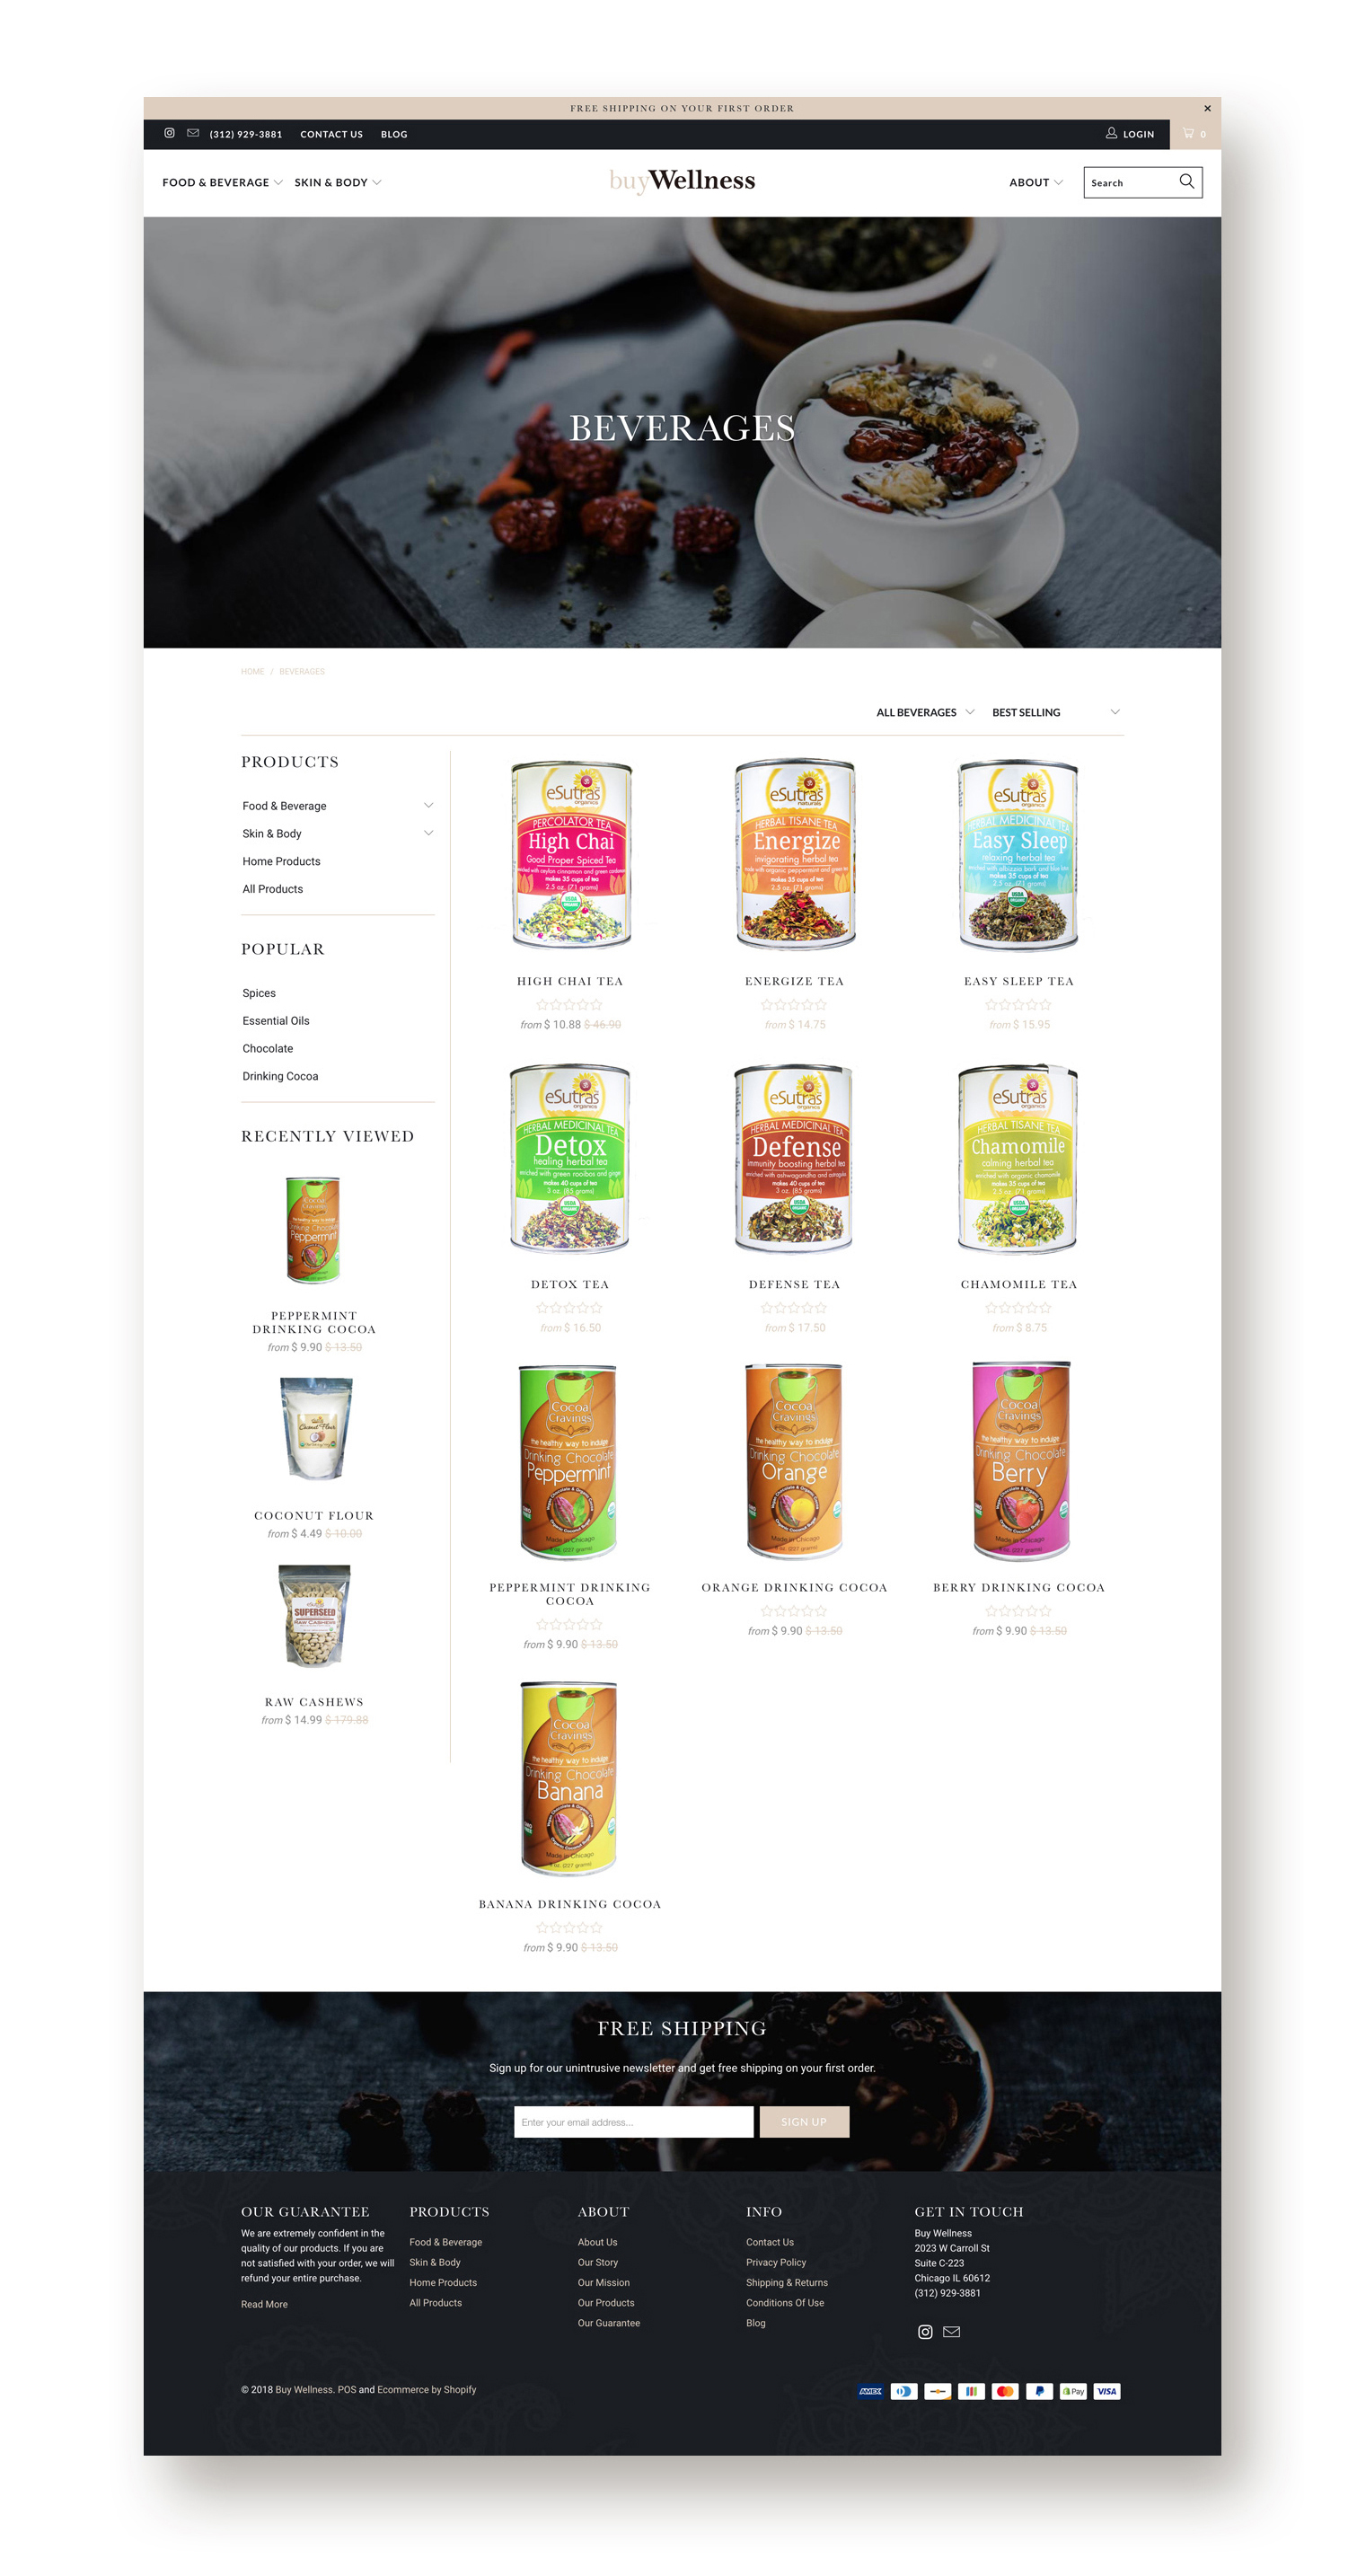 screencapture-buywellness-collections-beverage-mixes-1-2018-08-17-09_21_44_FW2.jpg